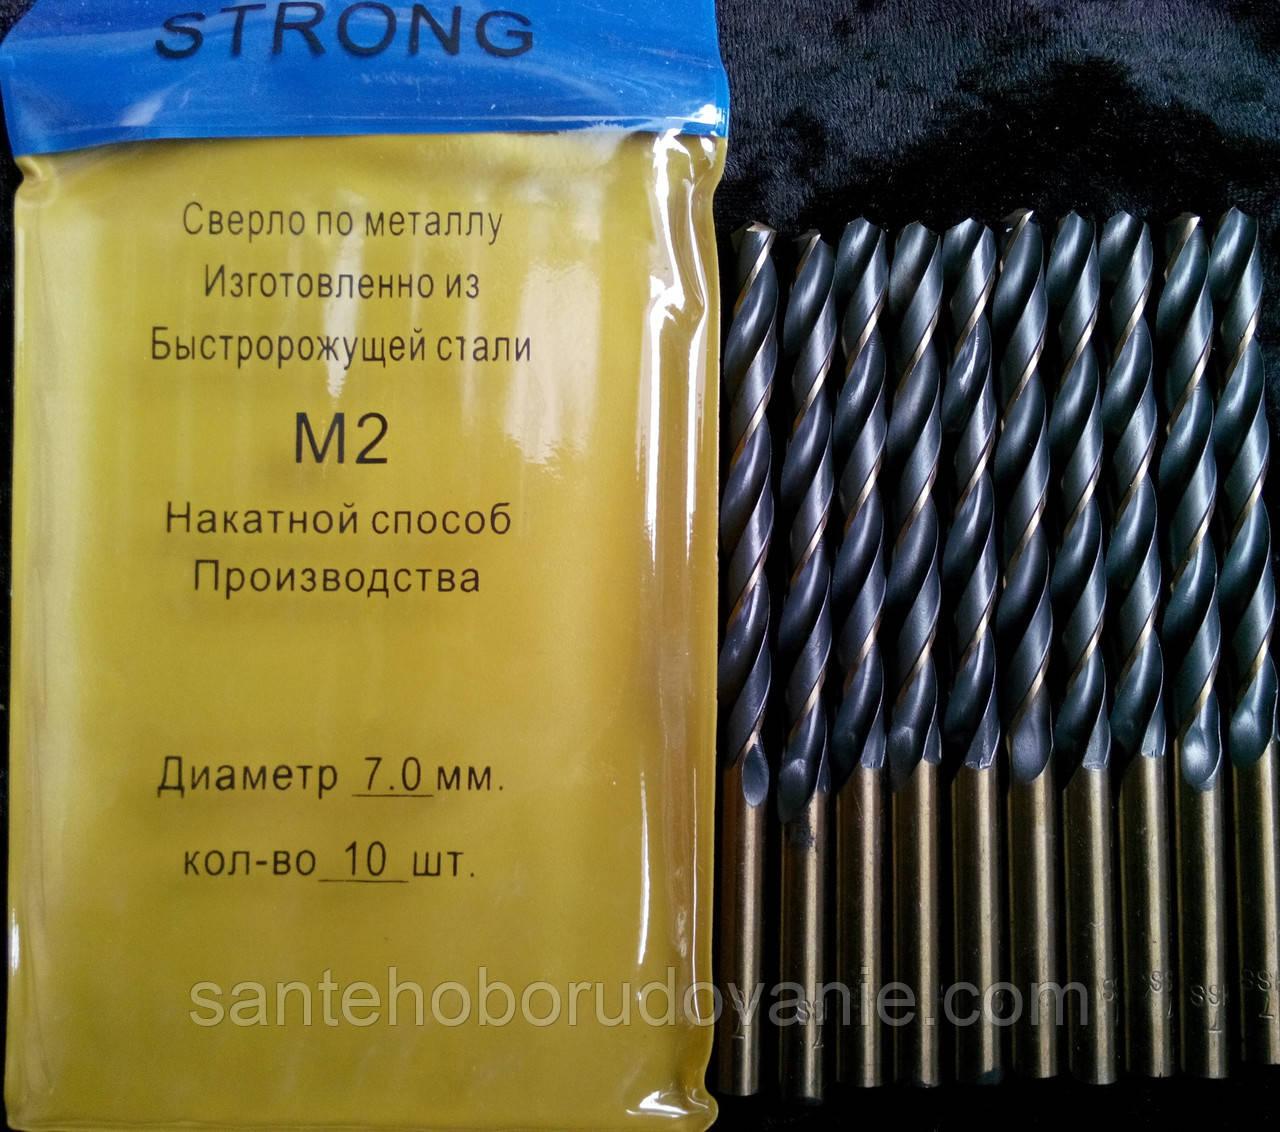 Сверло по металлу Р9 (HSS-Co) диаметр 7,0